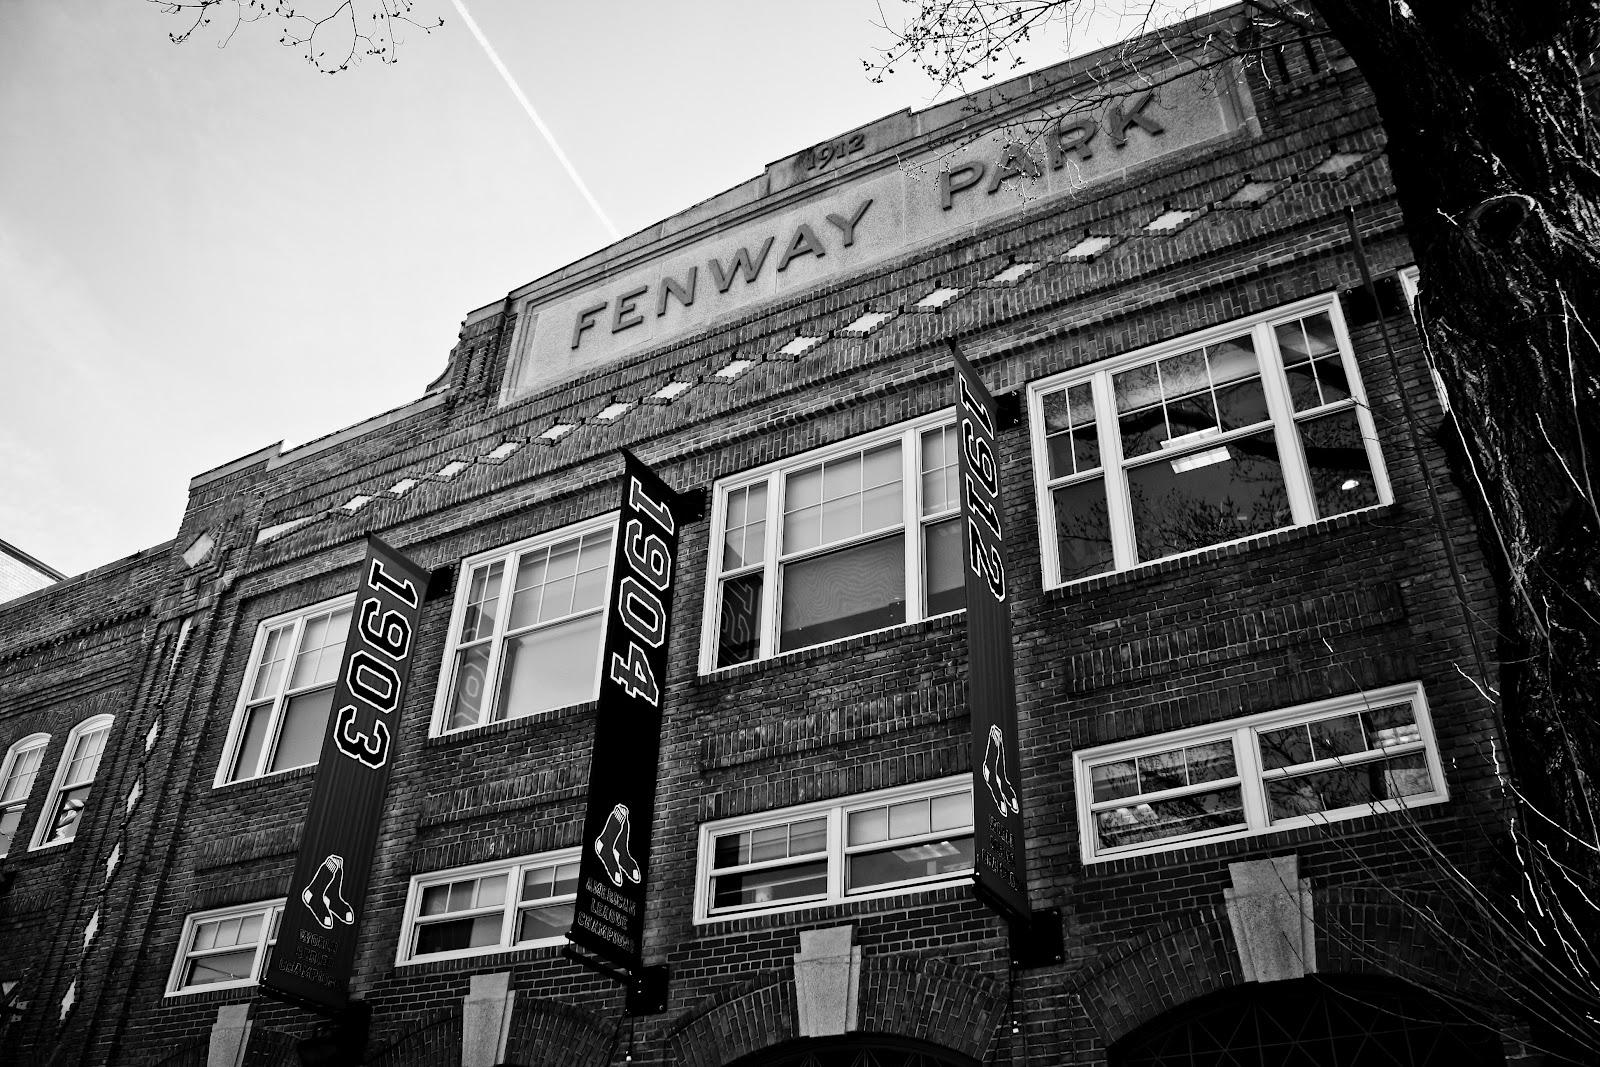 Fenway park wallpaper black and white